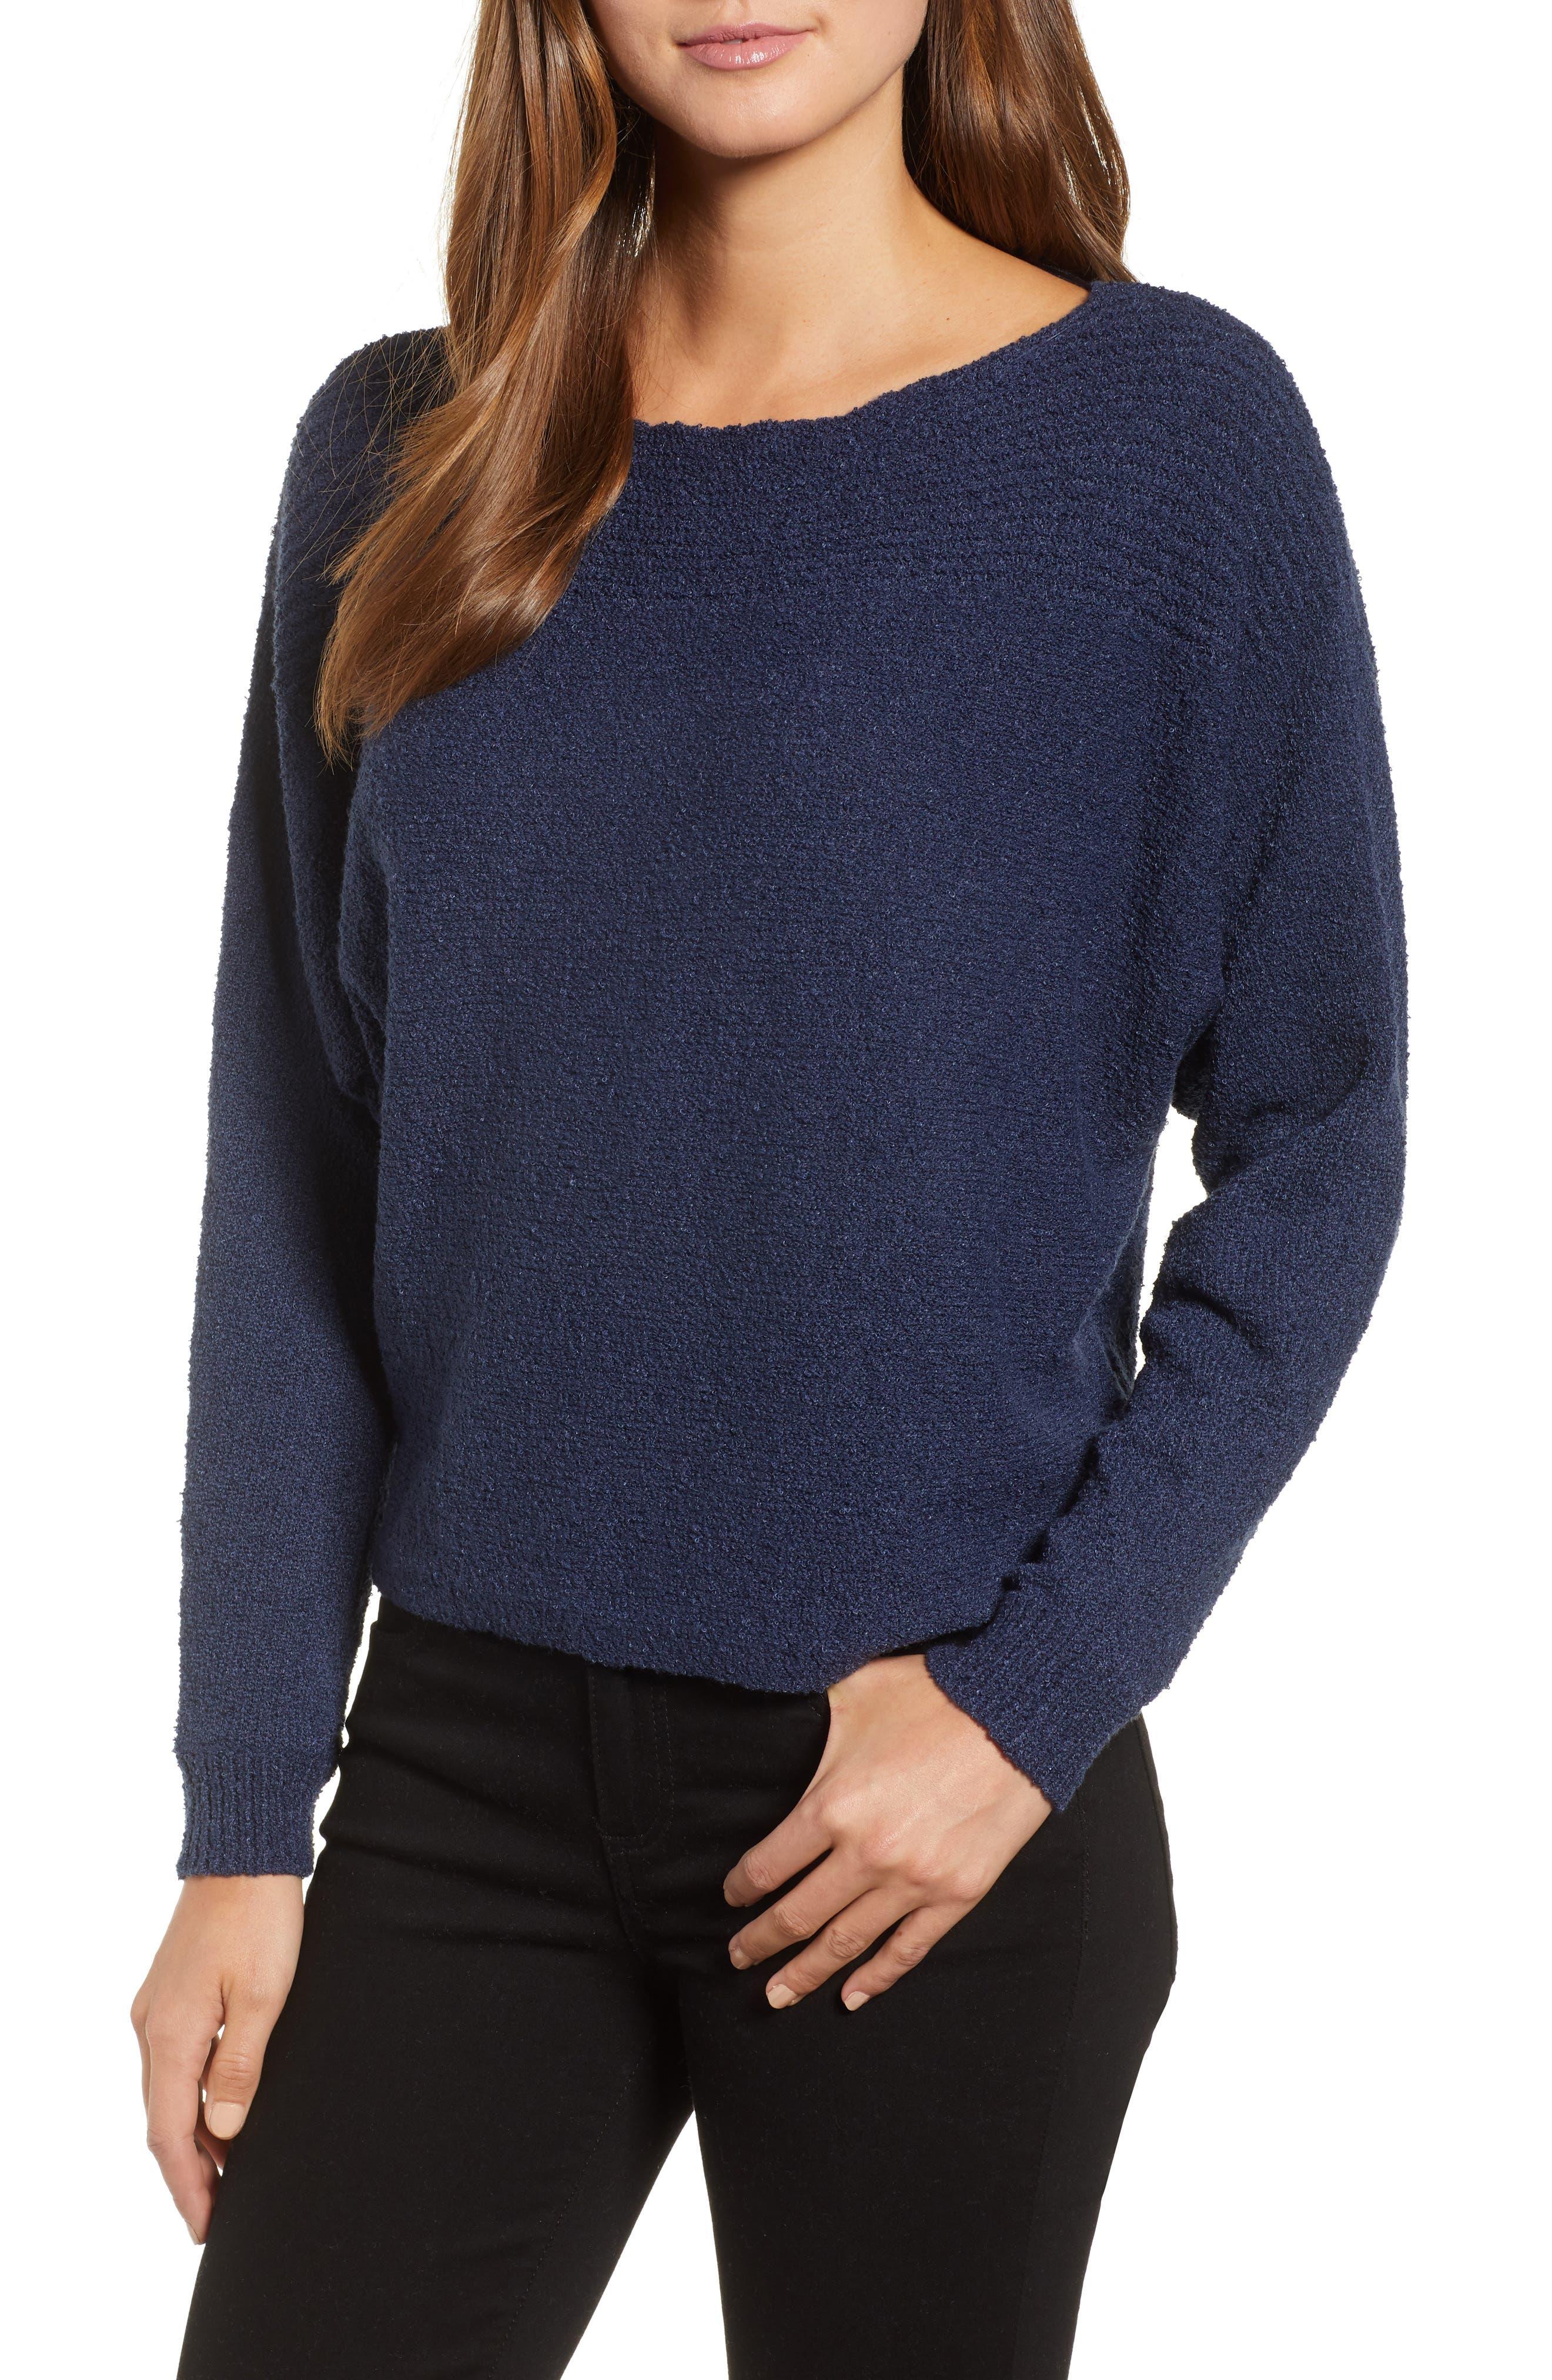 Calson<sup>®</sup> Dolman Sleeve Sweater,                             Main thumbnail 1, color,                             Navy Indigo